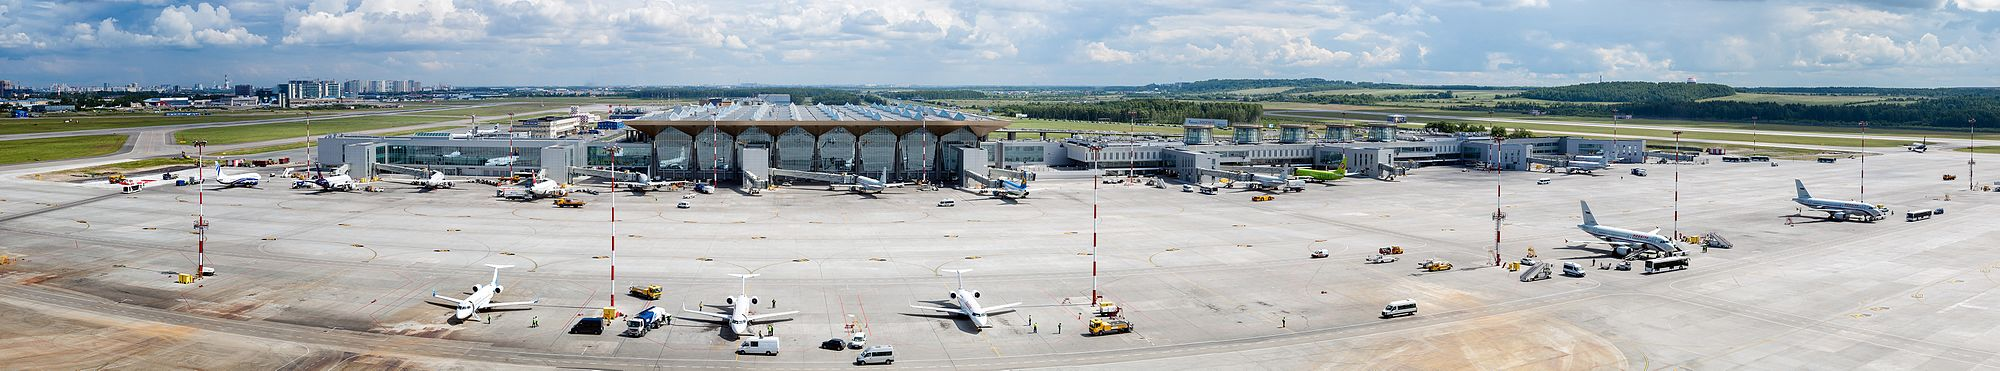 Панорама аэропорта Пулково с